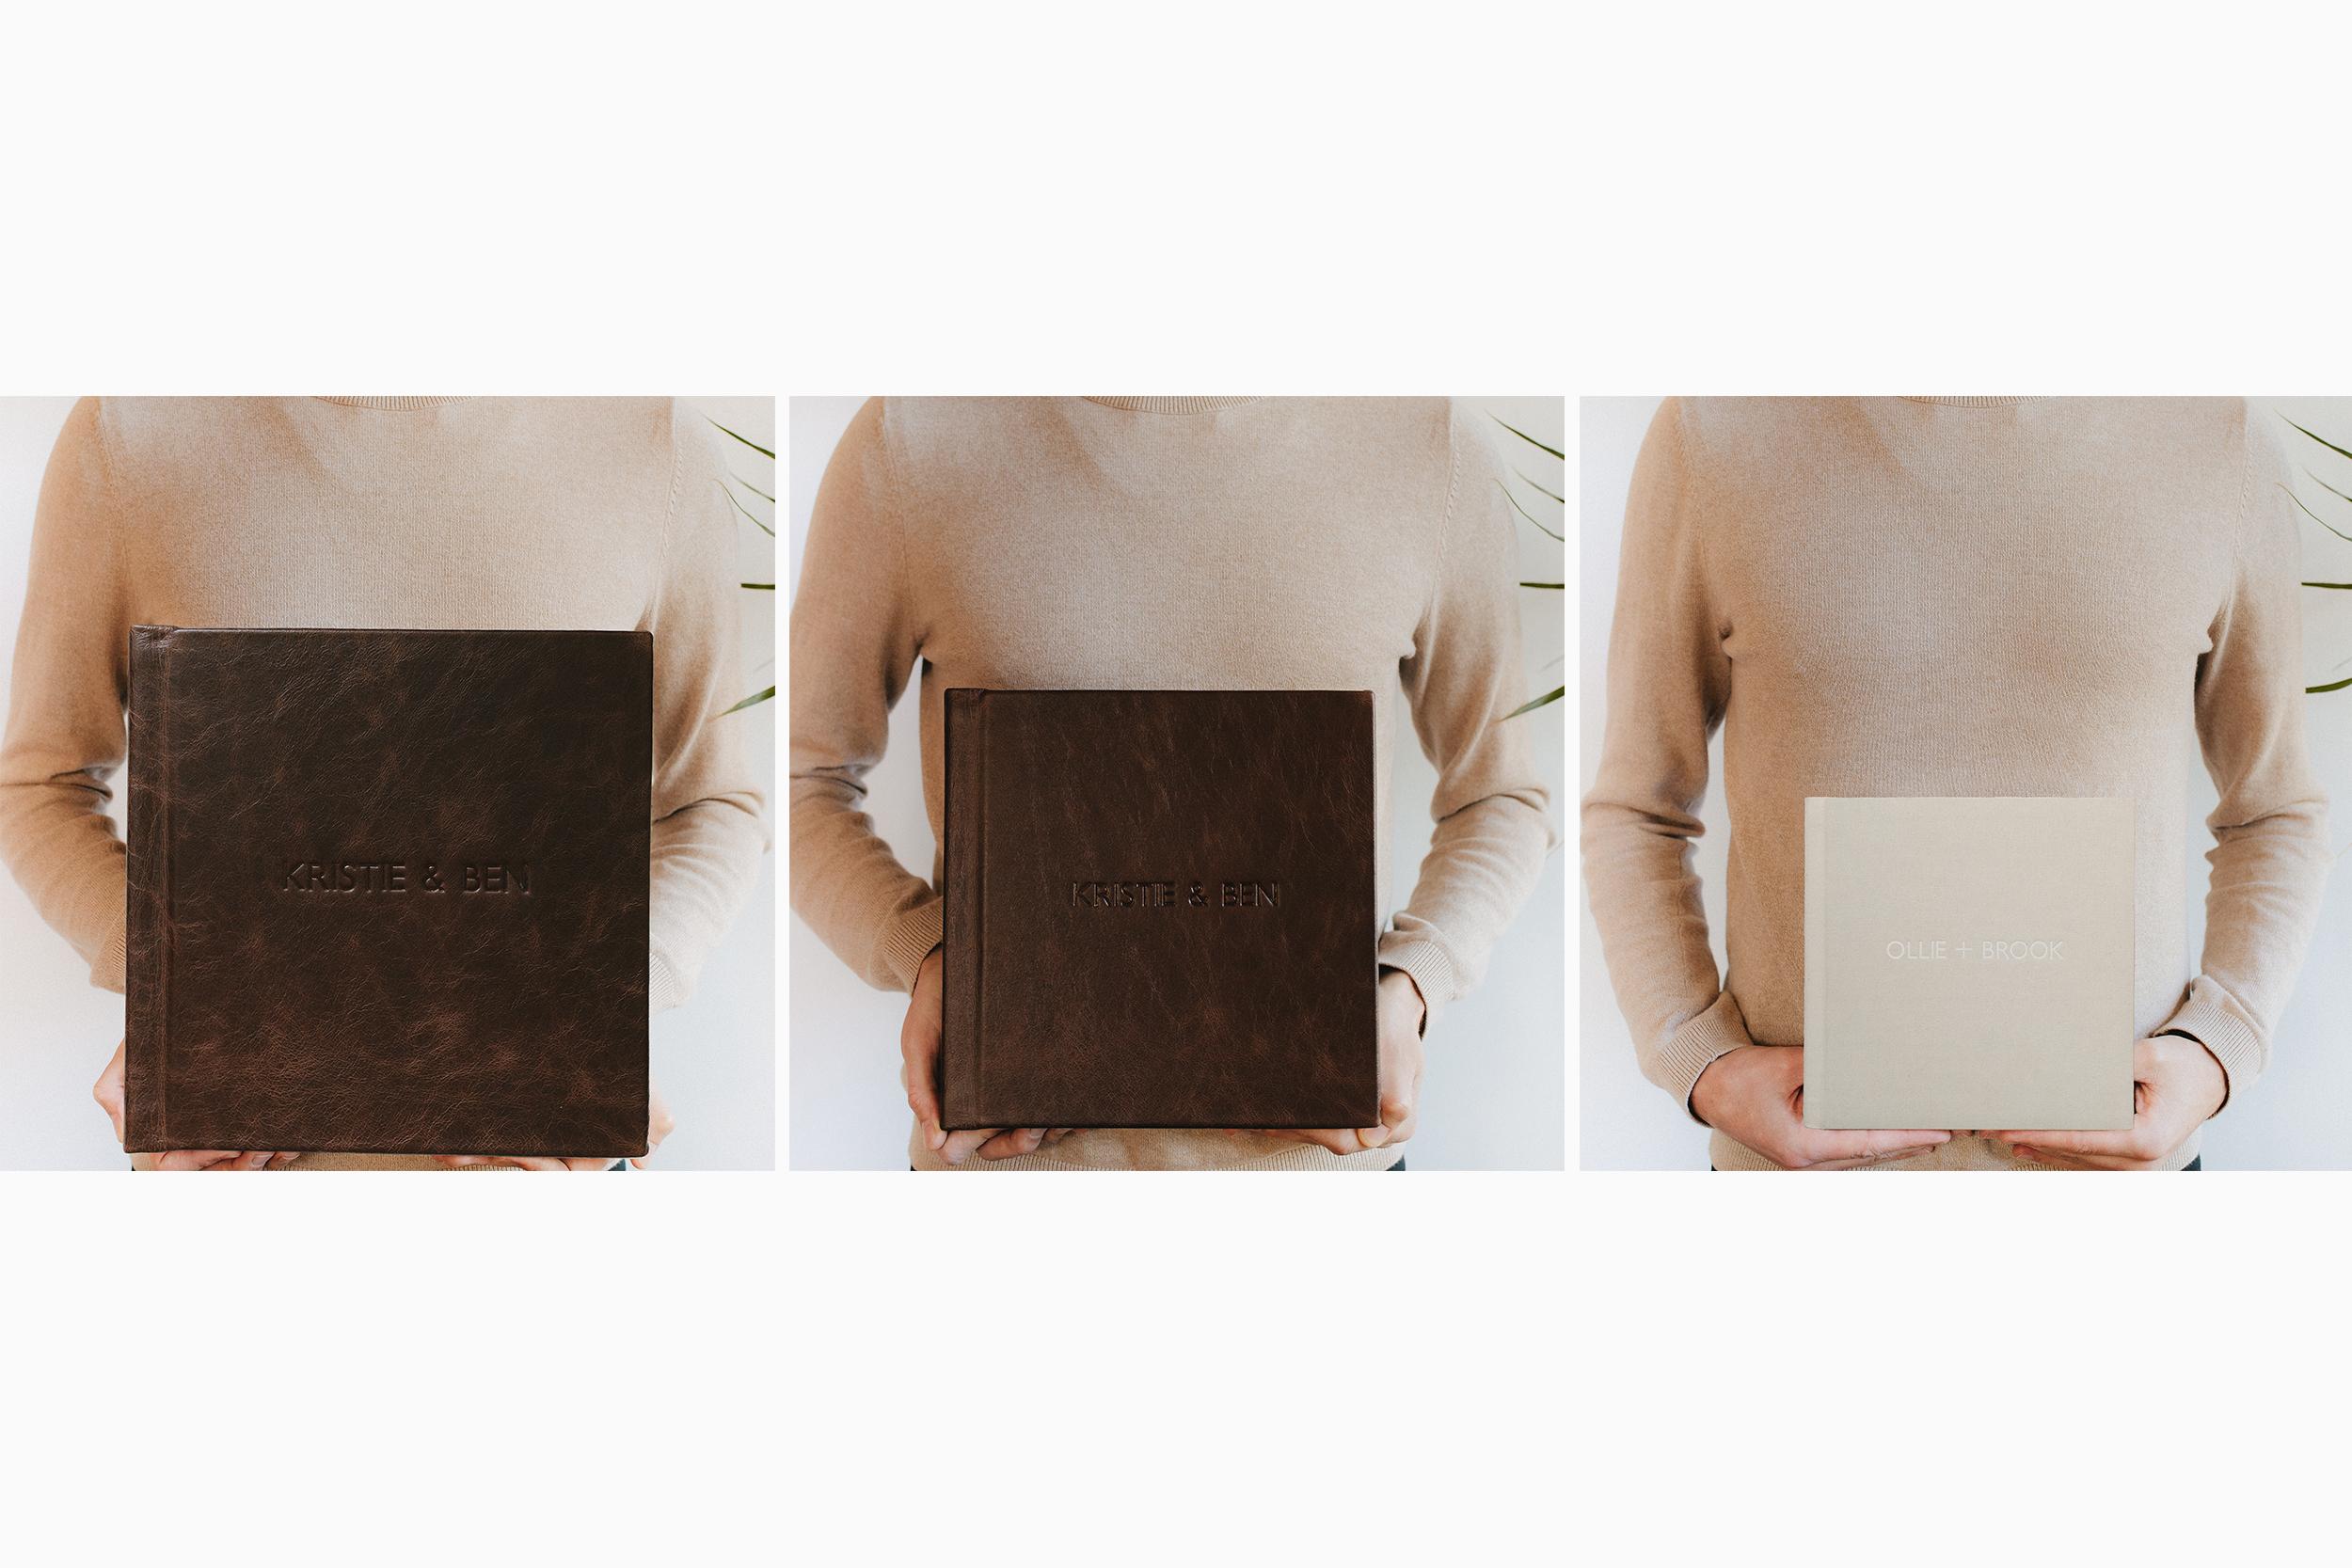 Album size in 6x4.jpg